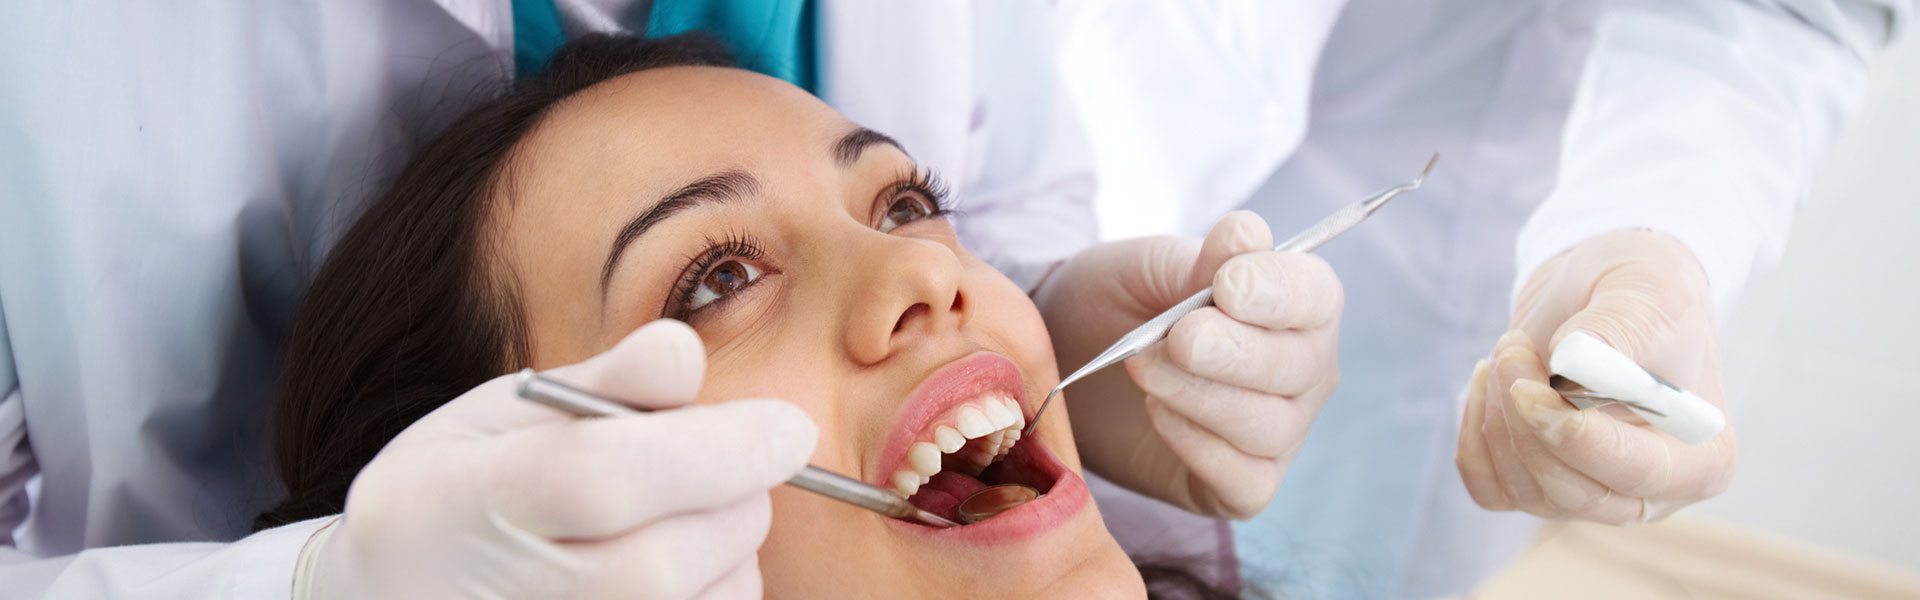 A woman is having a dental sugary at the dental